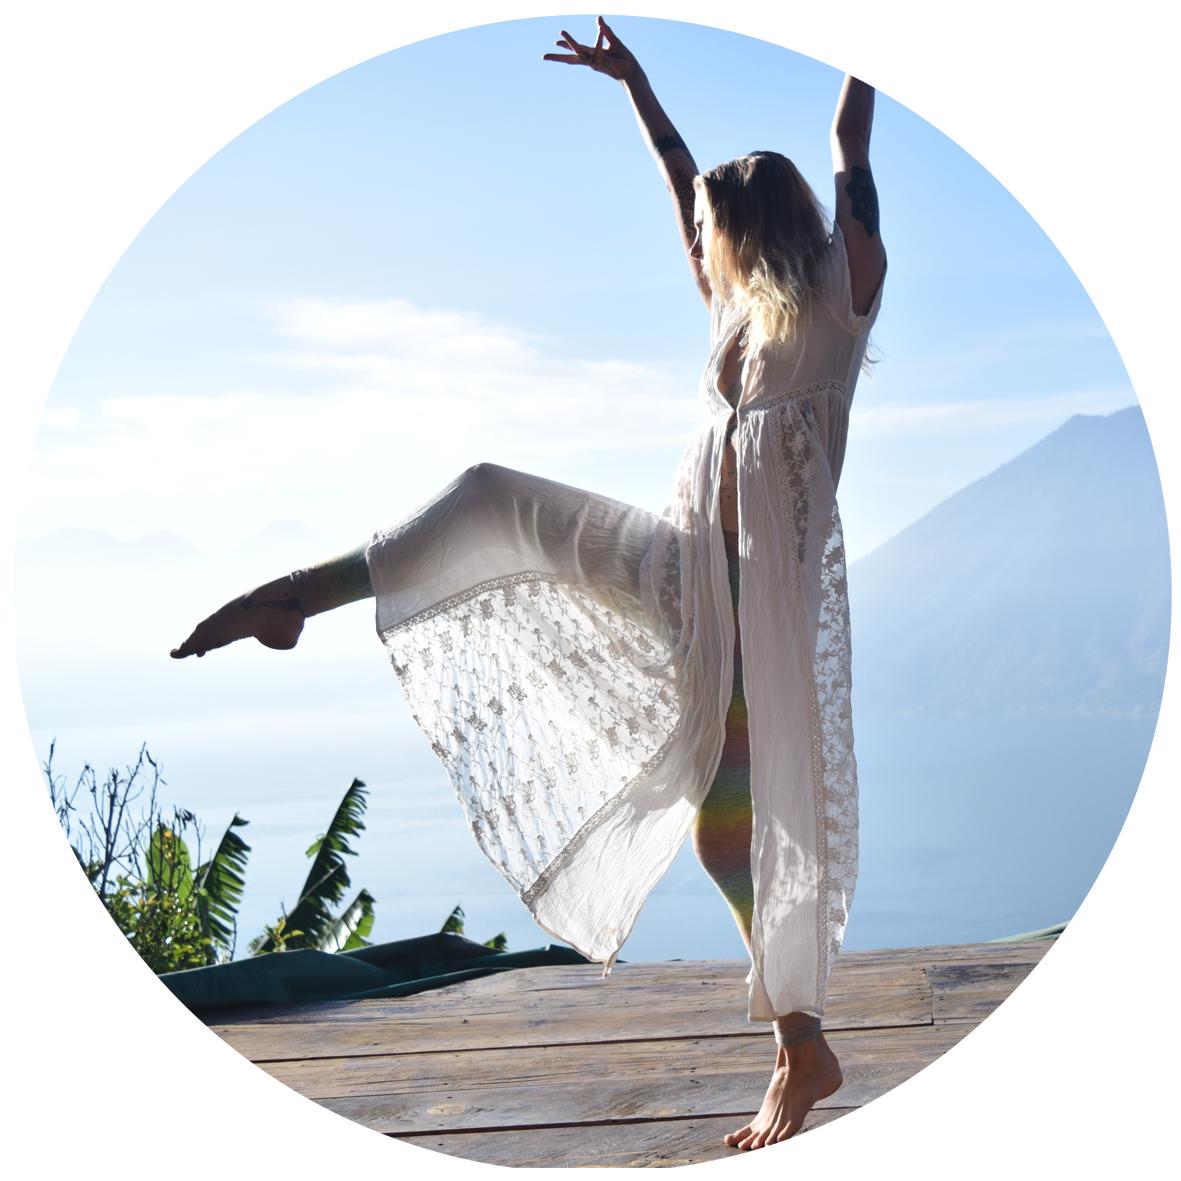 Private Kundalini Yoga session